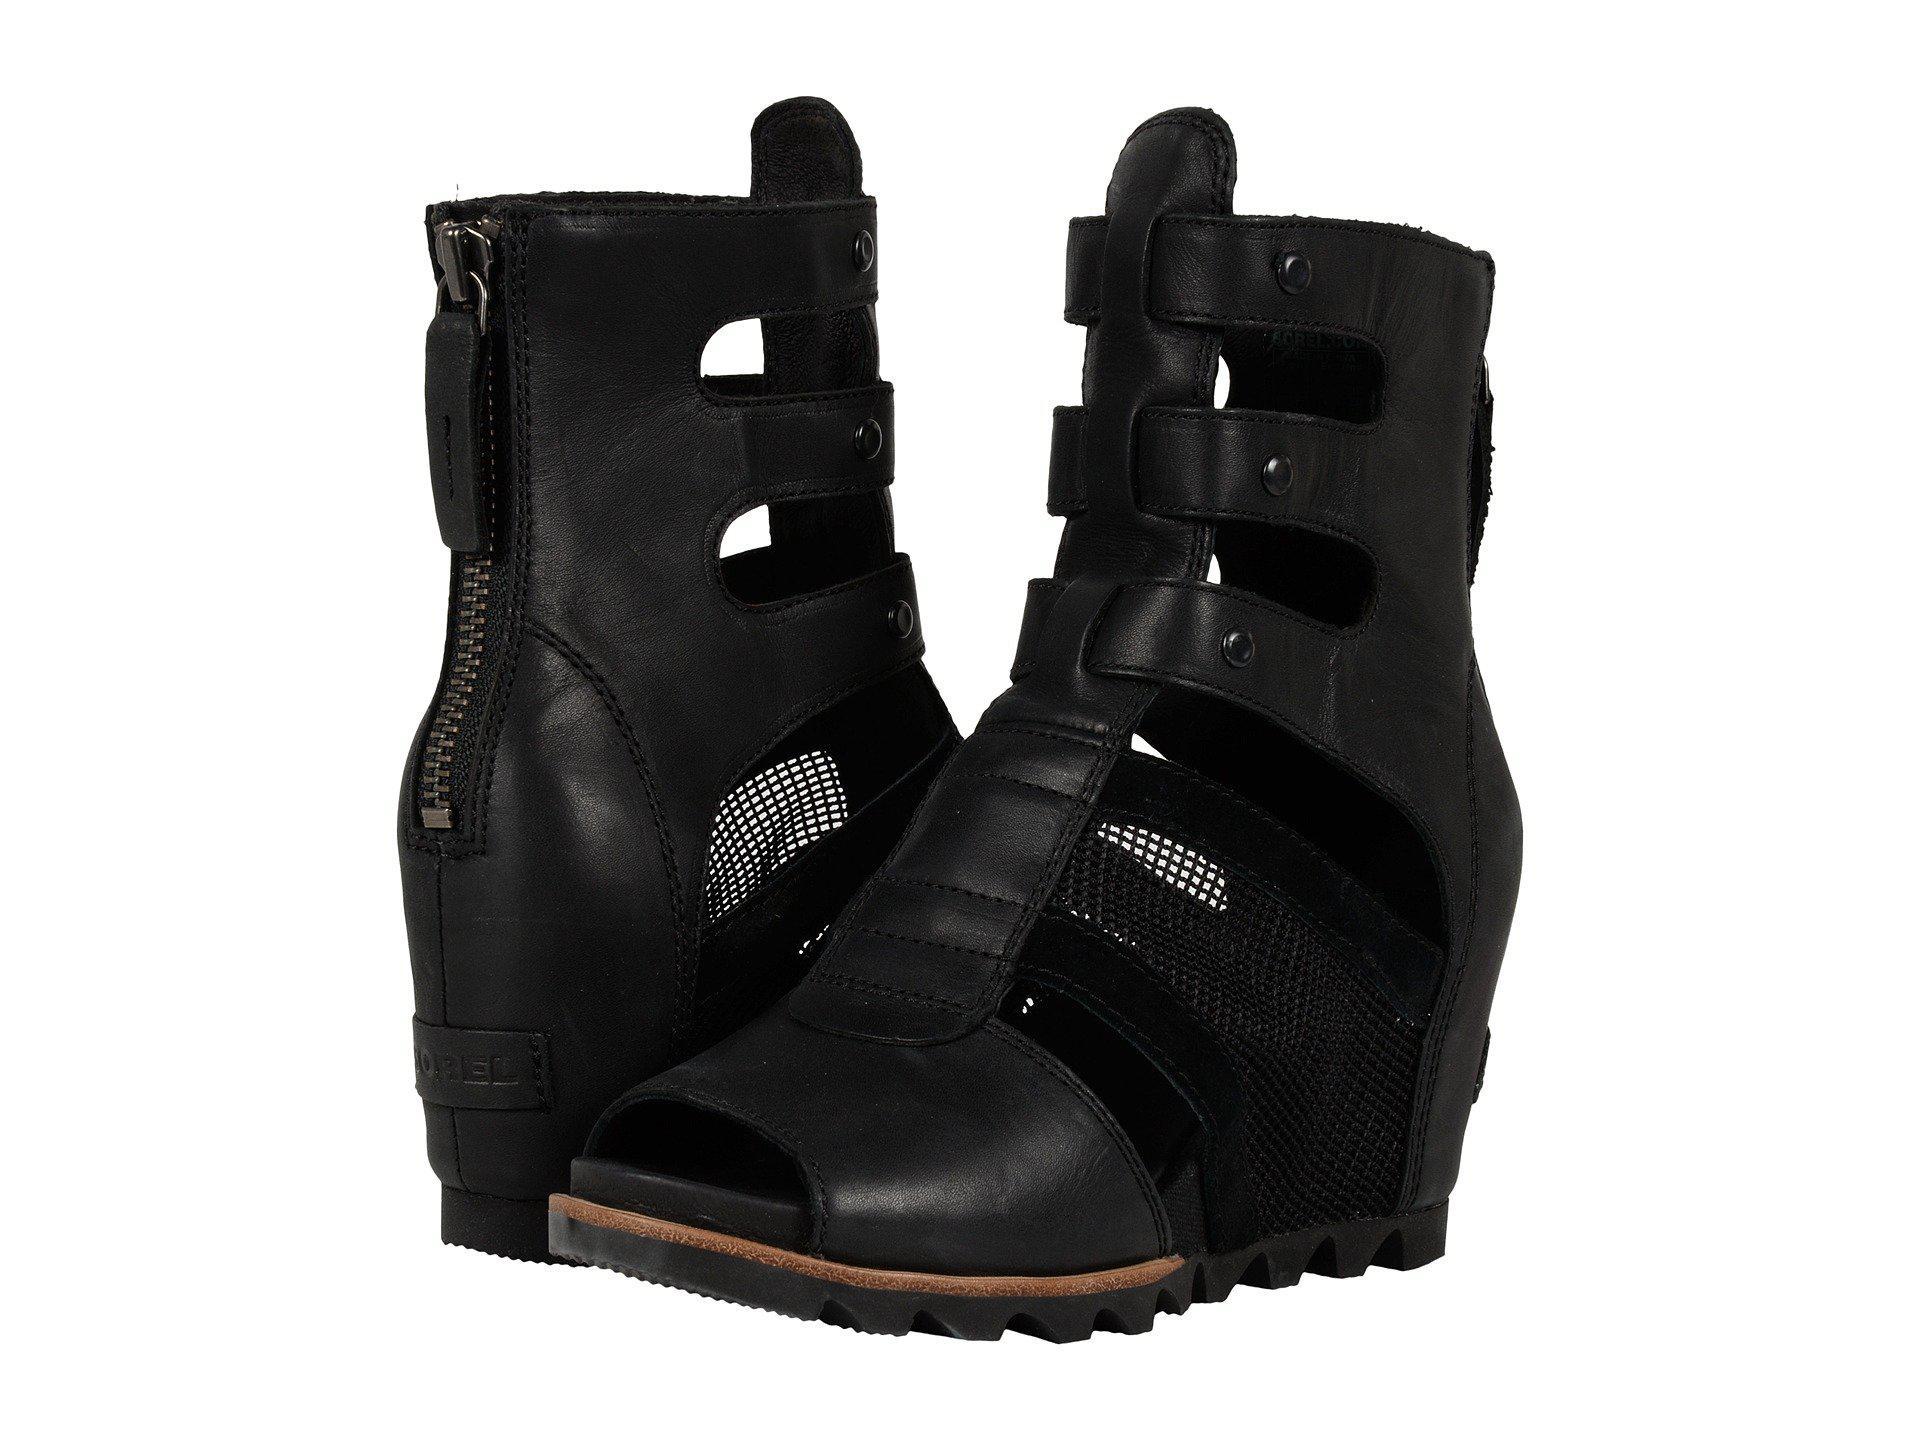 4a32394ca70e Lyst - Sorel Joanie Gladiator in Black